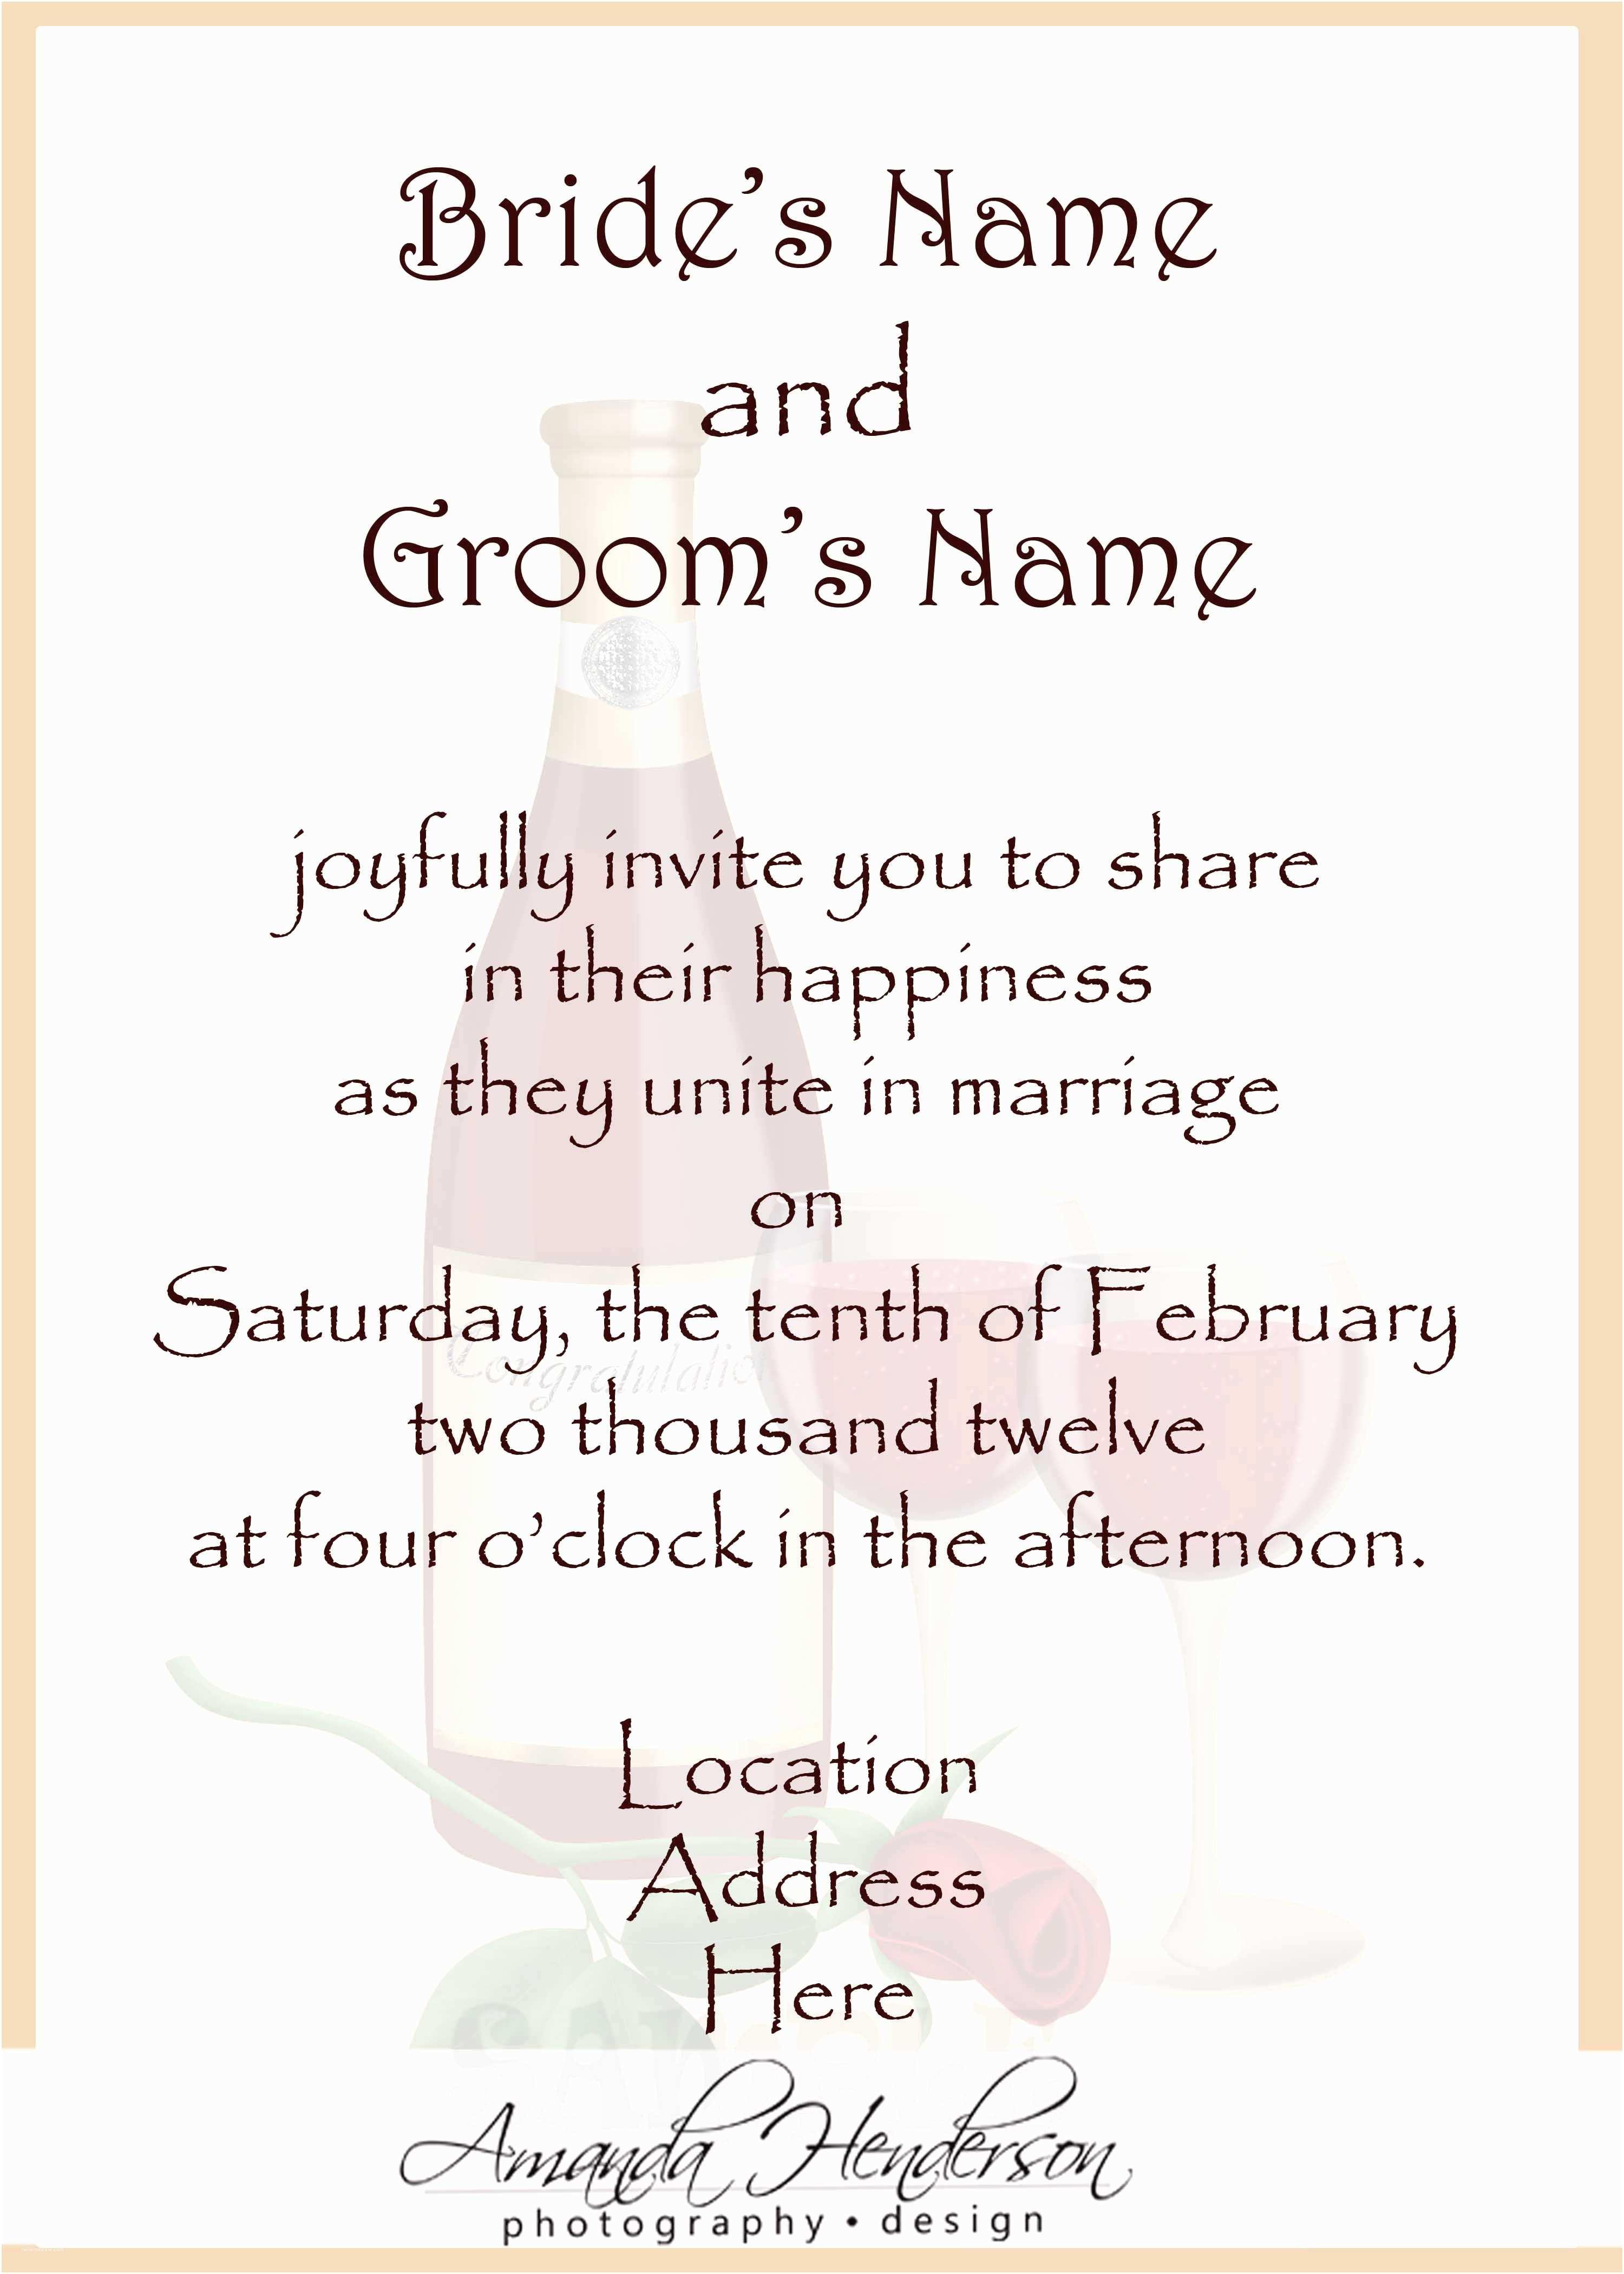 Wedding Invitation Wording From Nephew Wedding Invitation Wording Samples